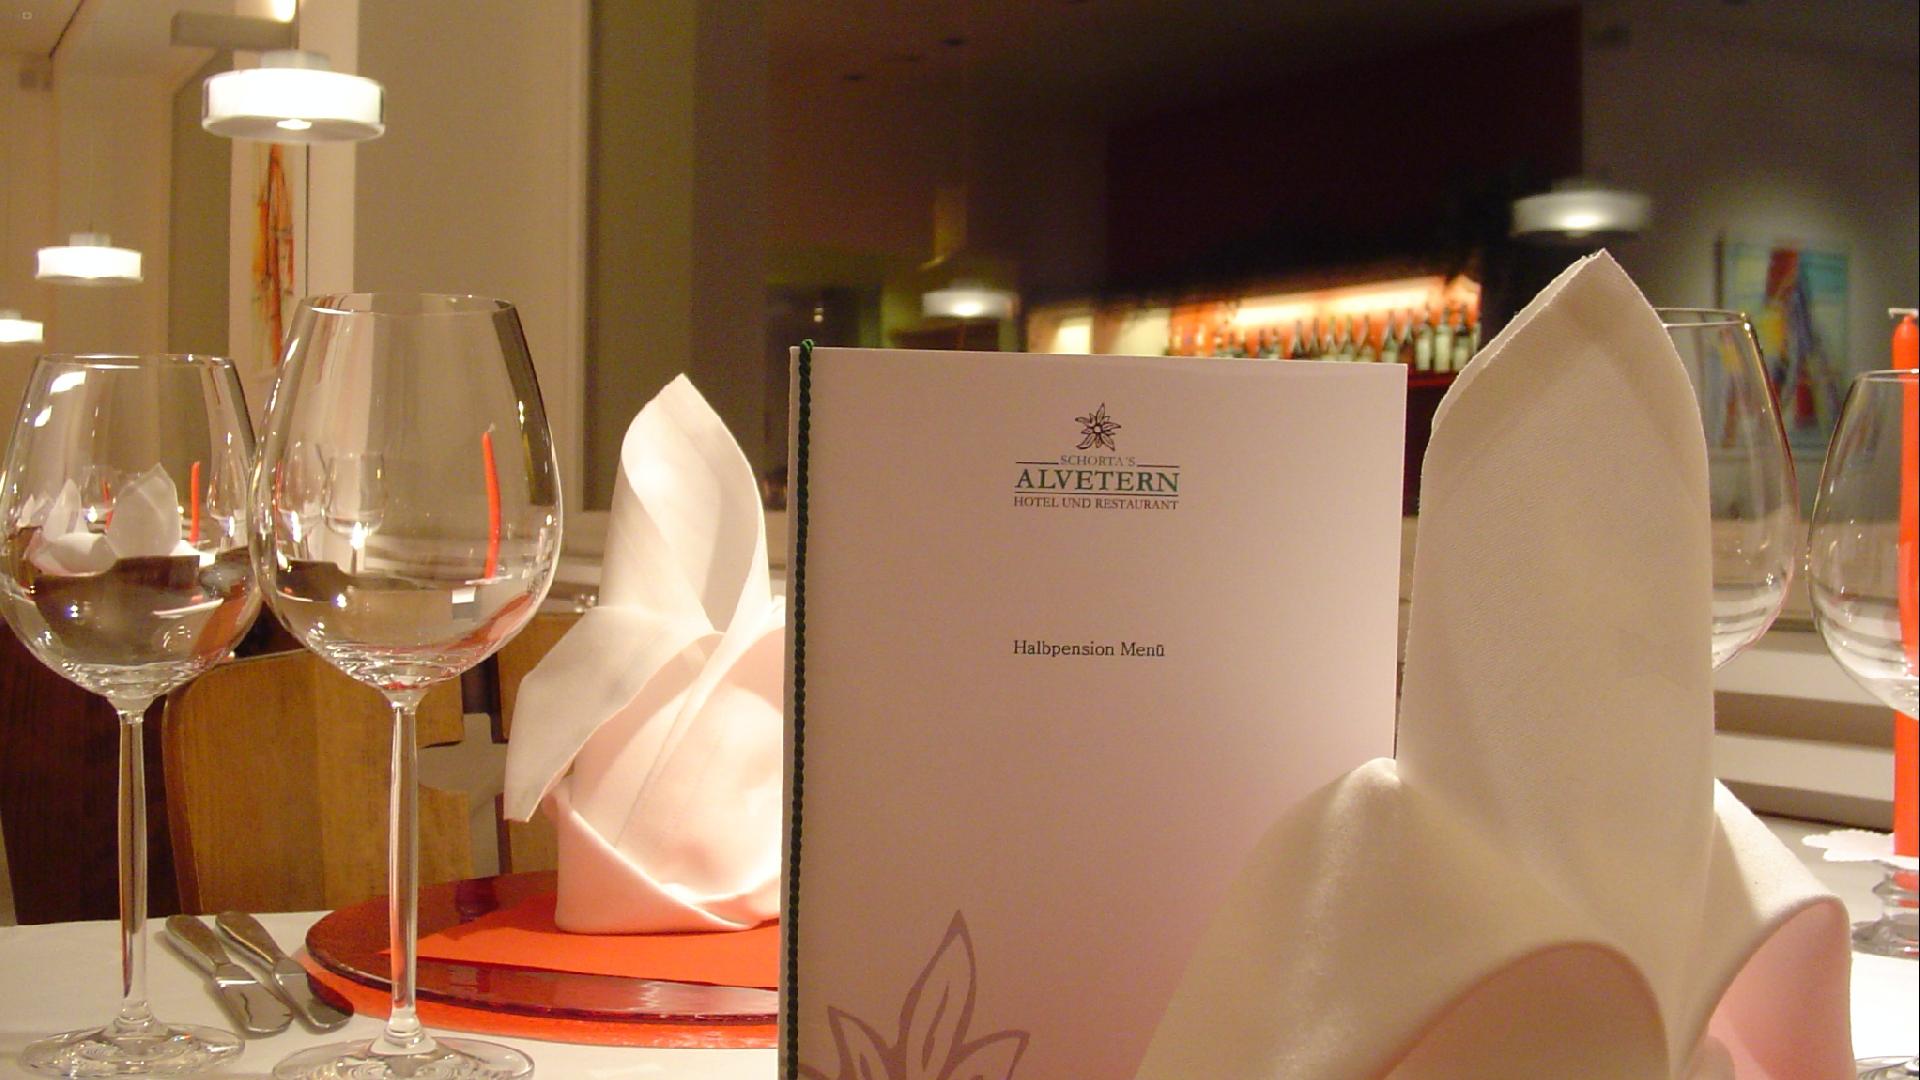 Schorta's Hotel Alvetern 3